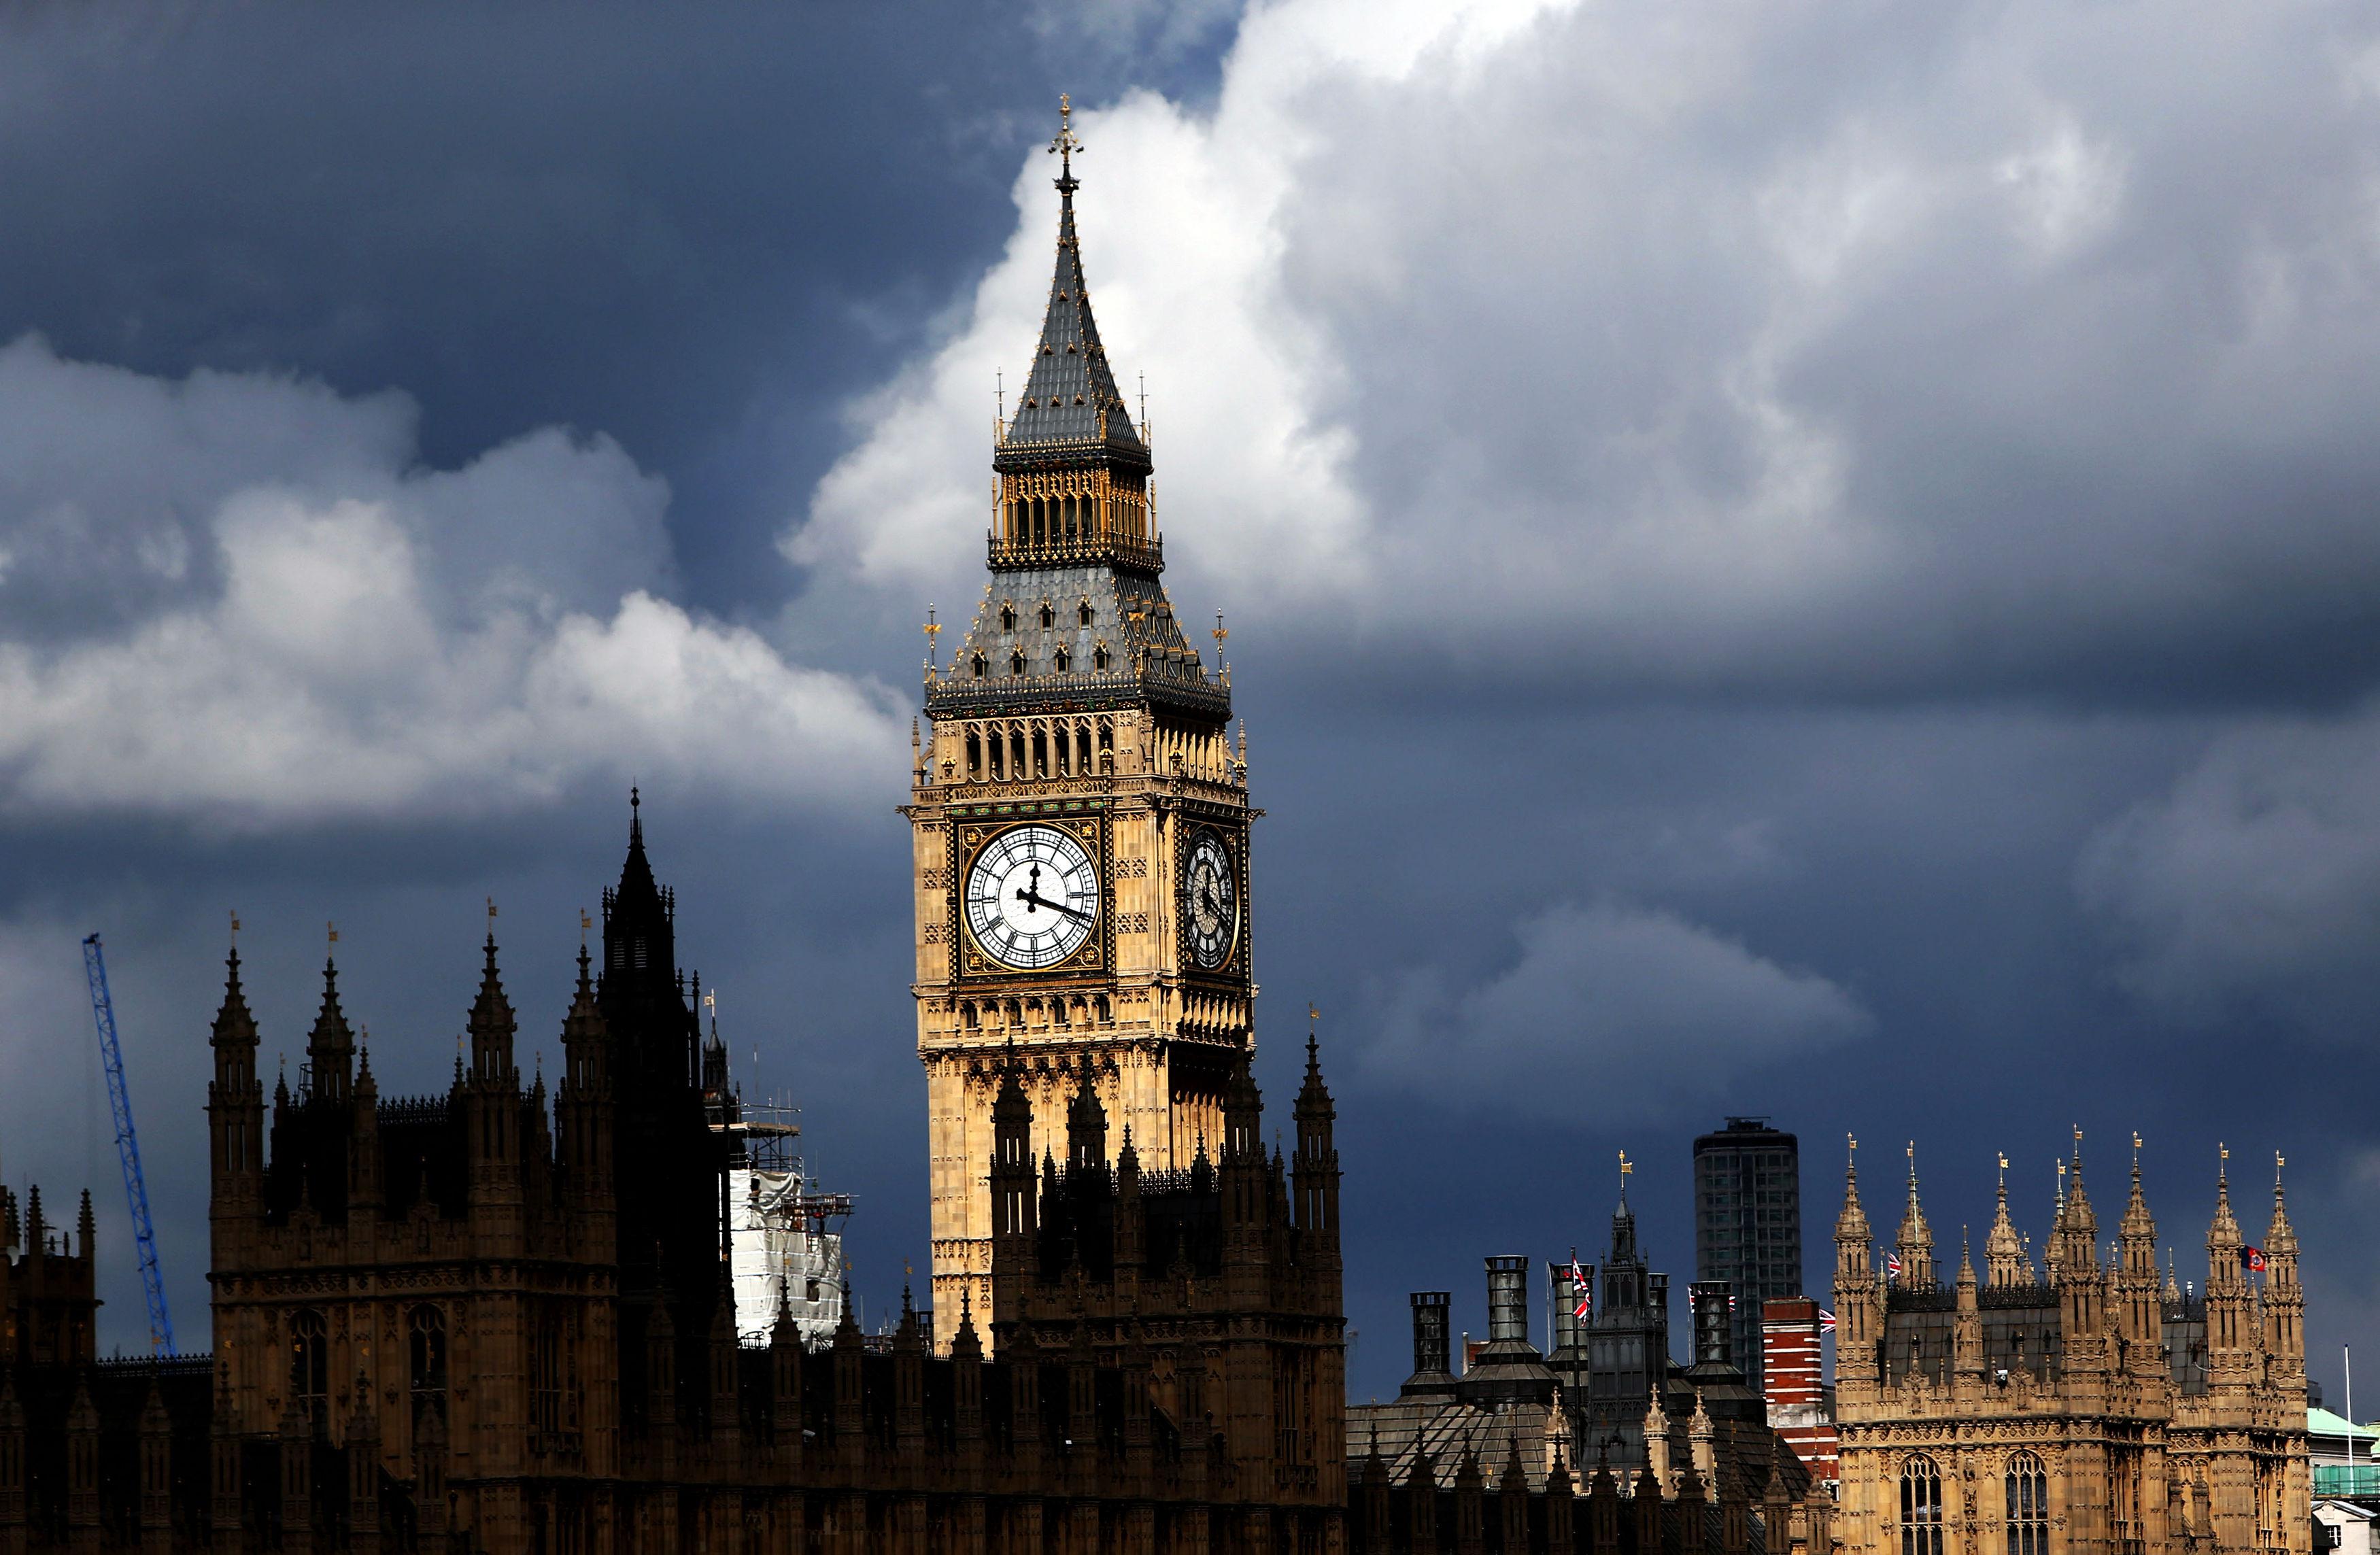 Big Ben on Sept. 19, 2013.